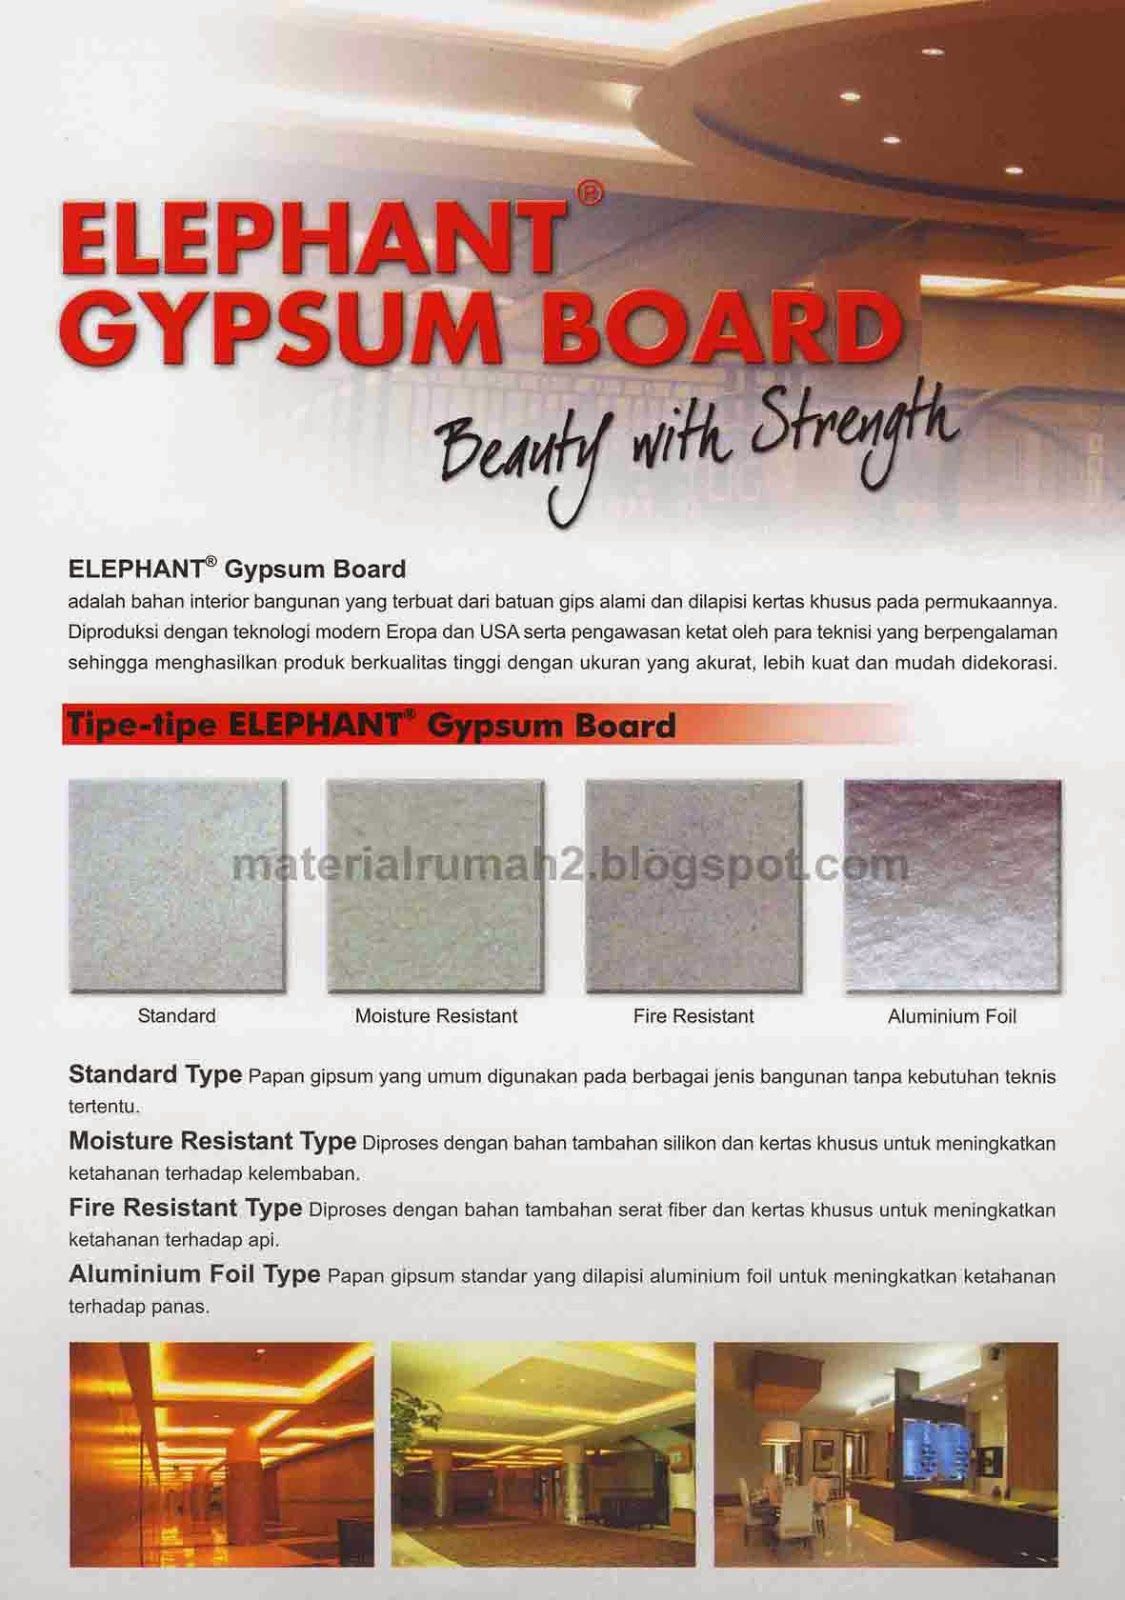 Brosur Katalog ELEPHANT GYPSUM BOARD  Rumah Material